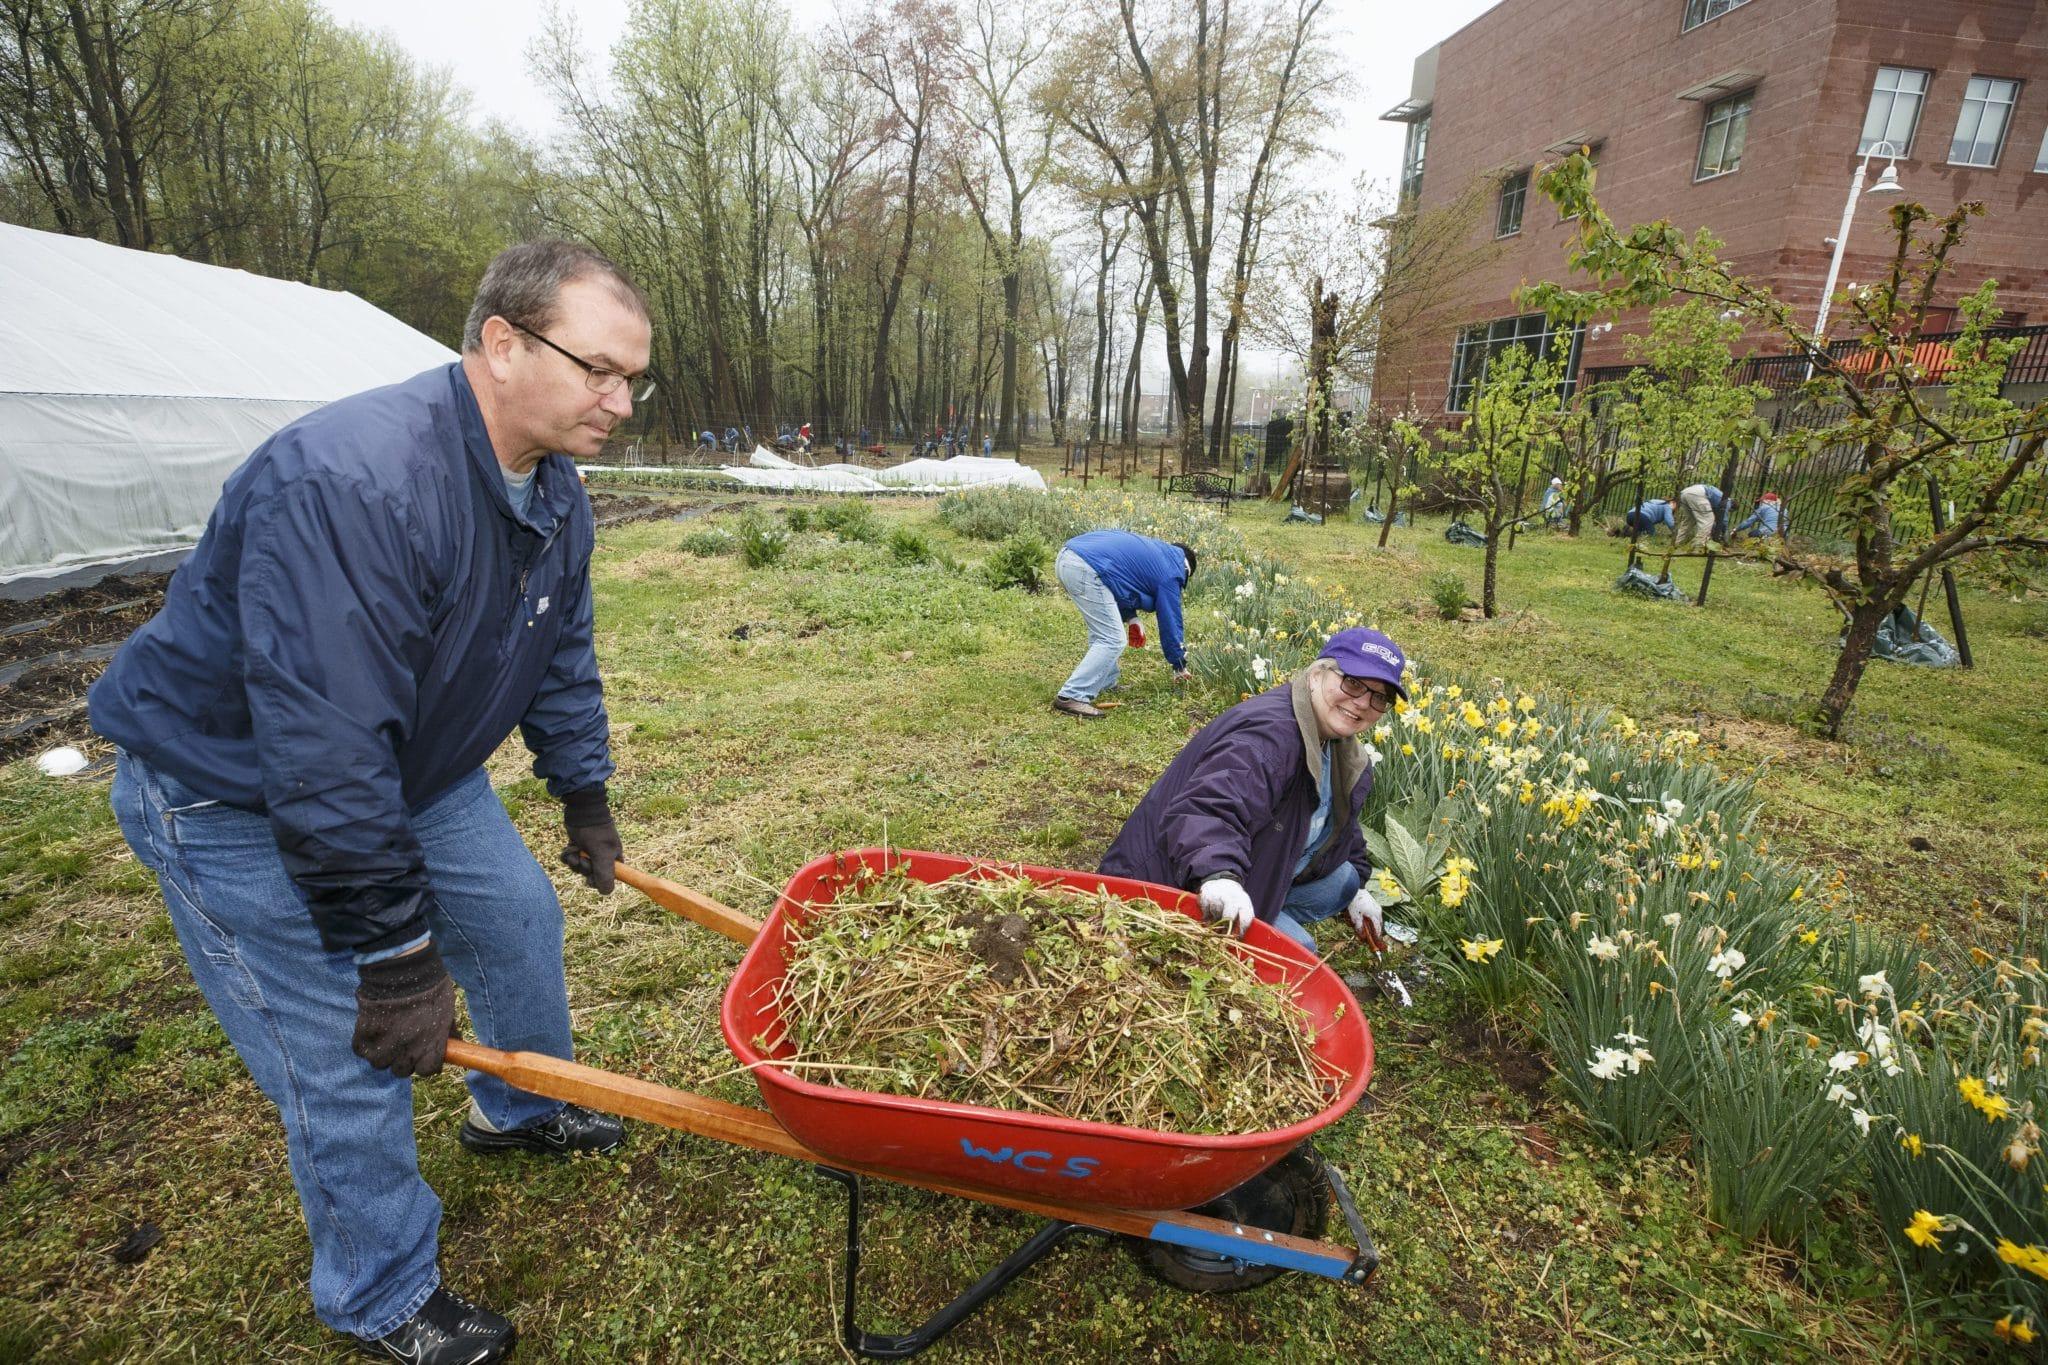 wc-smith-community-service-day